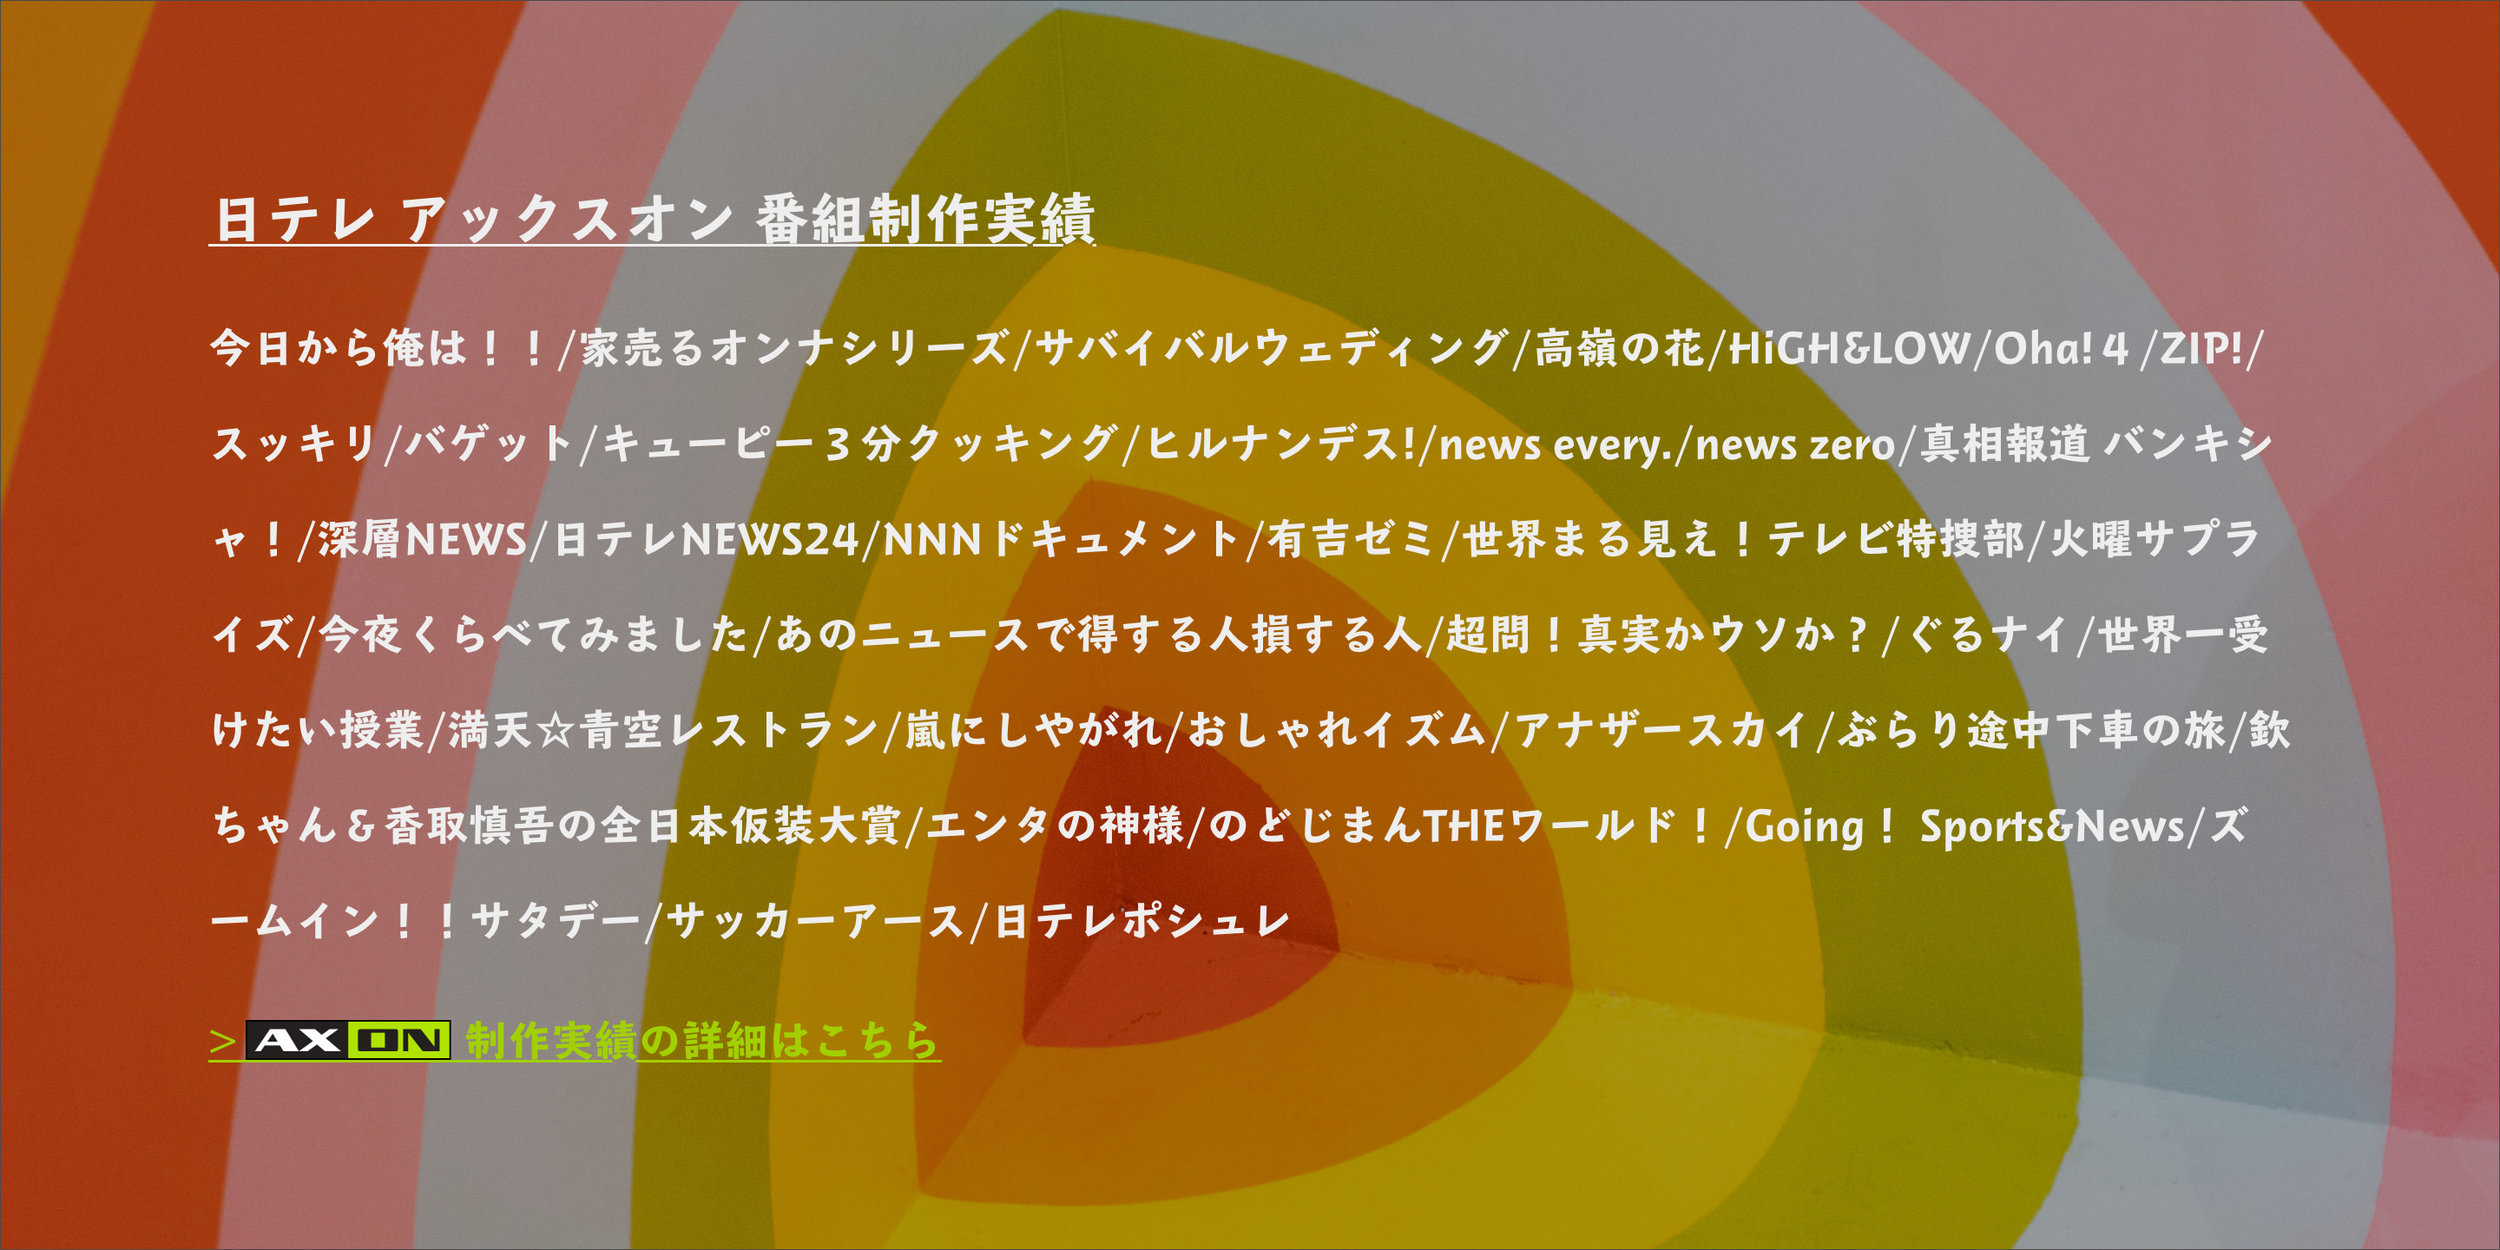 axon_works.jpg